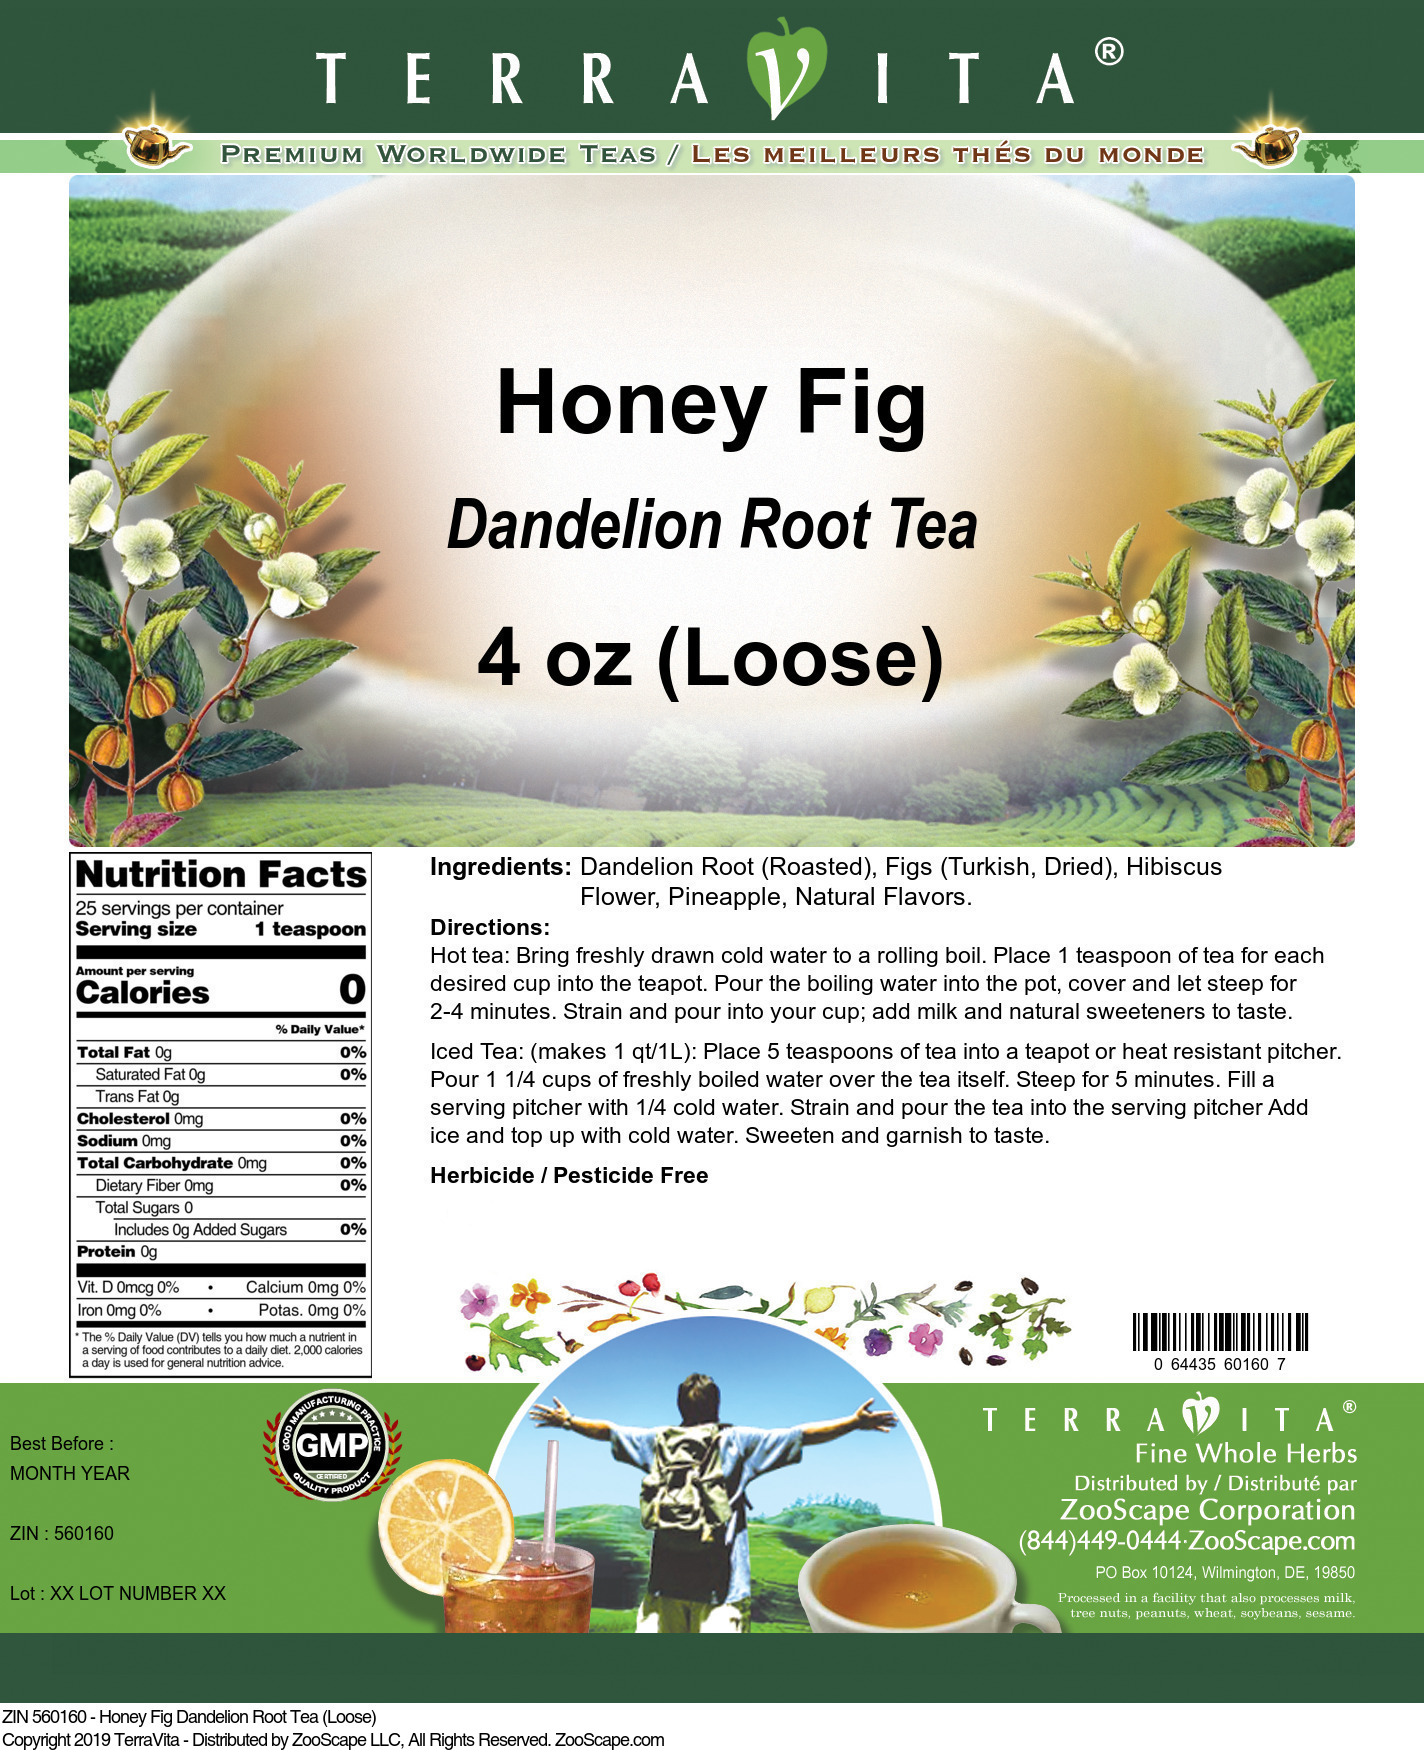 Honey Fig Dandelion Root